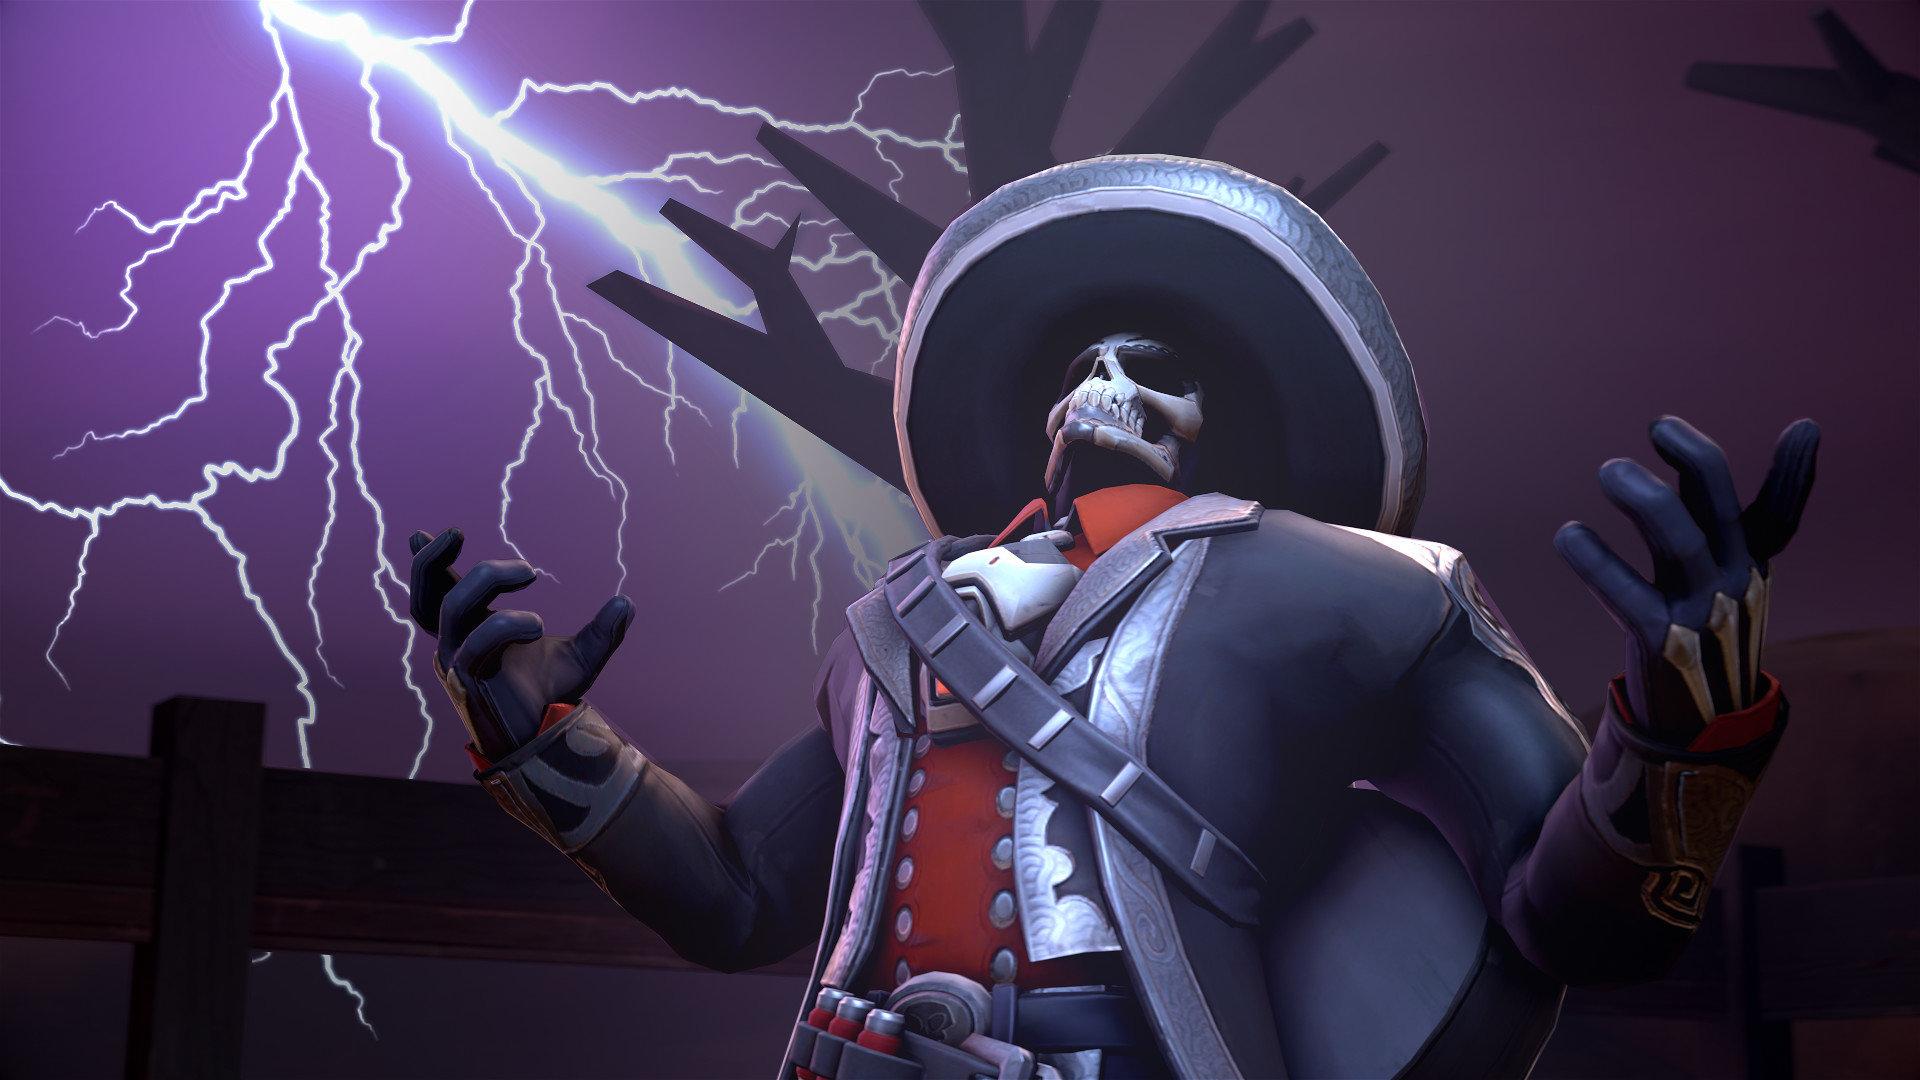 High Resolution Reaper Overwatch Hd 1080p Wallpaper Id